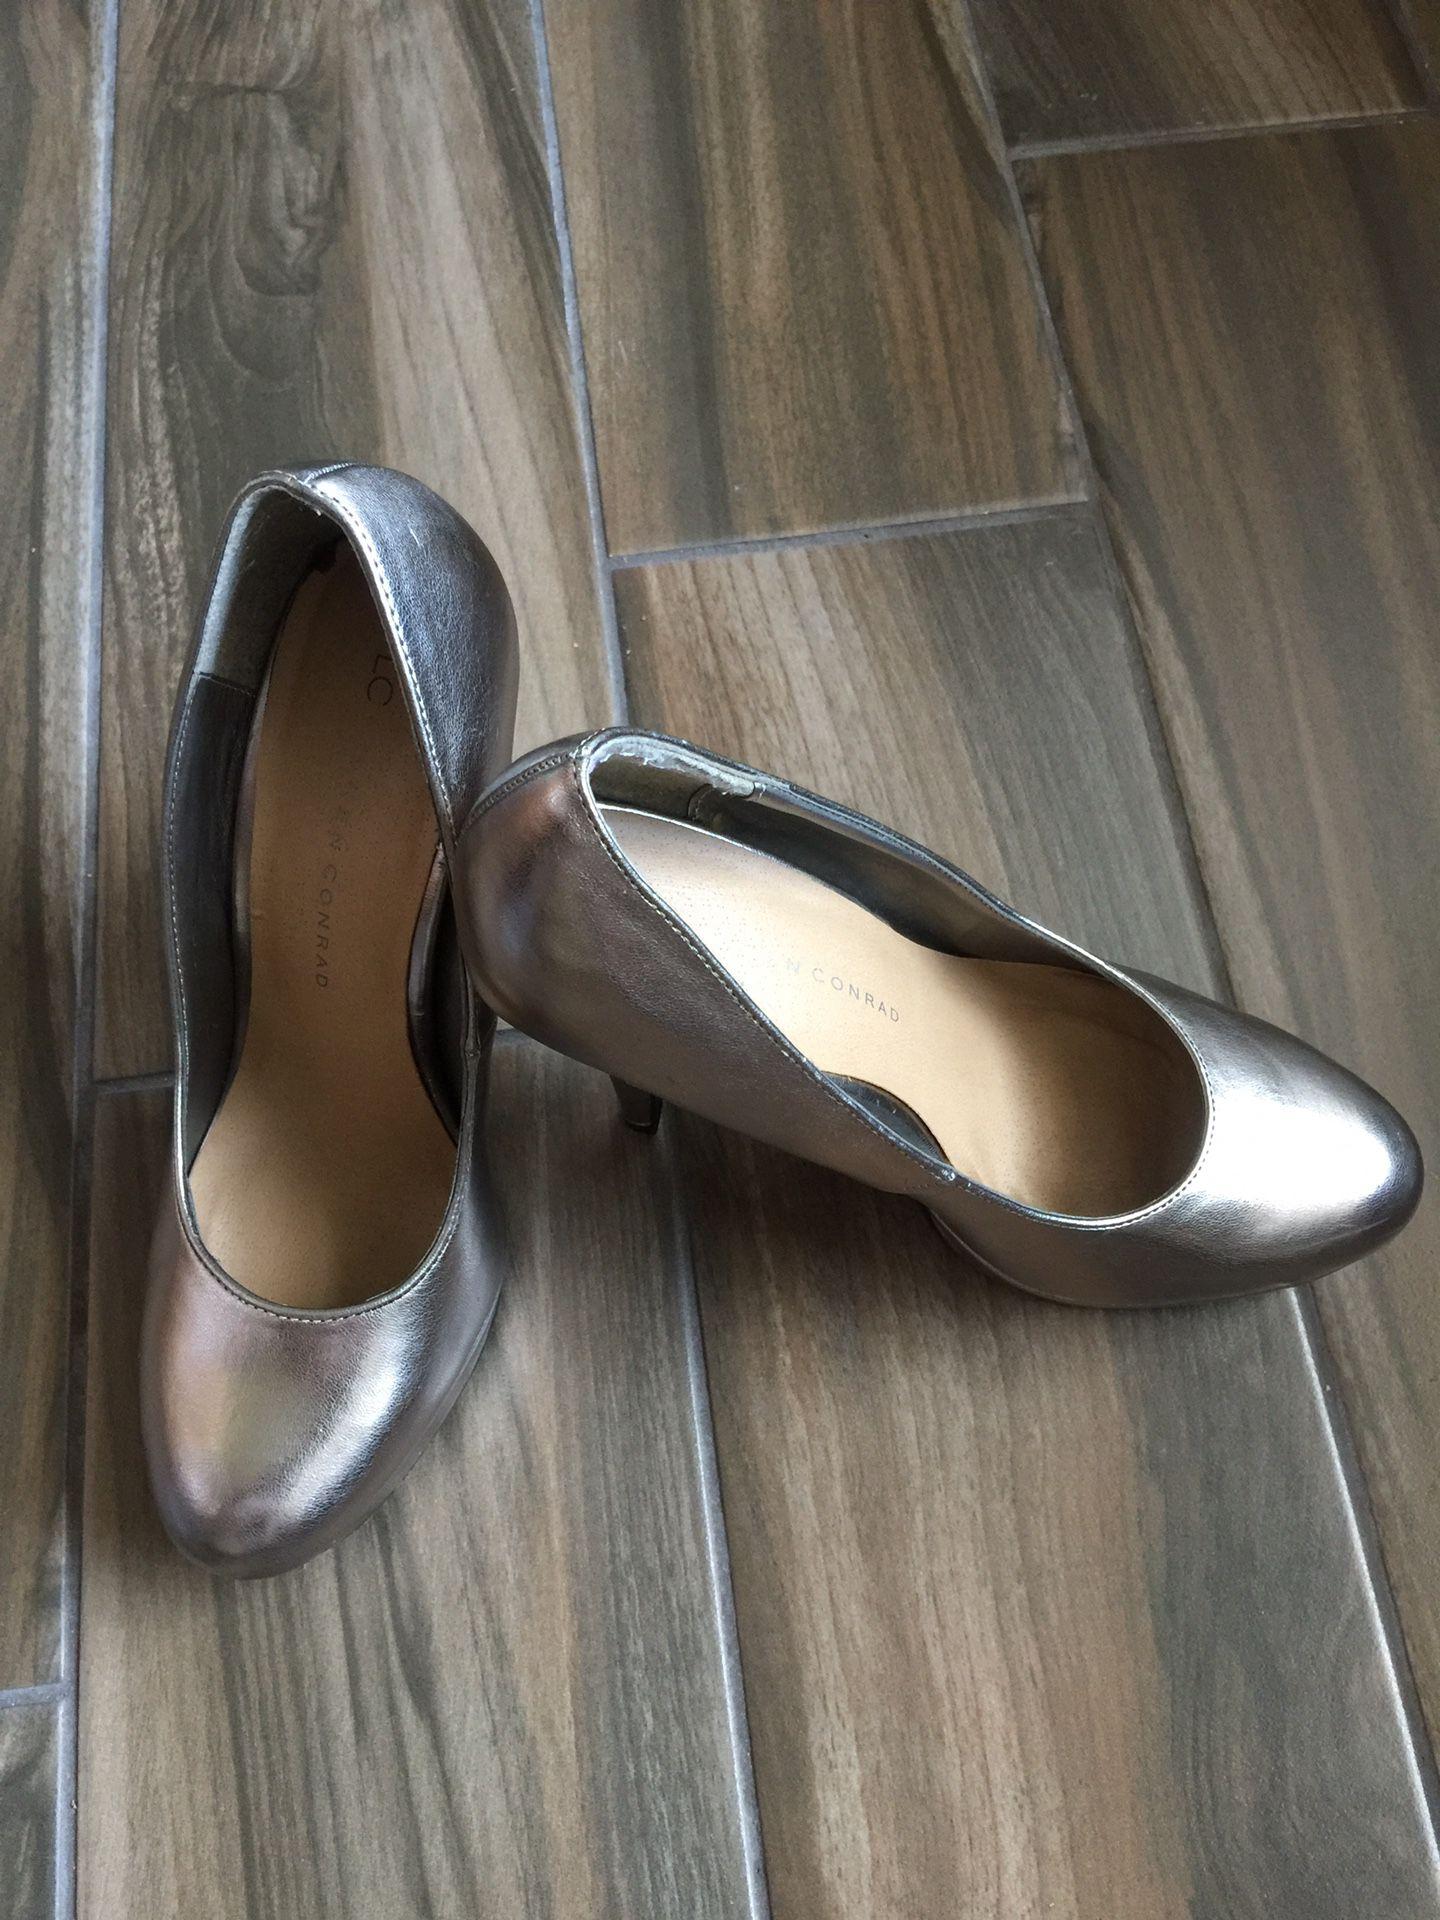 Heeled shoes size 7